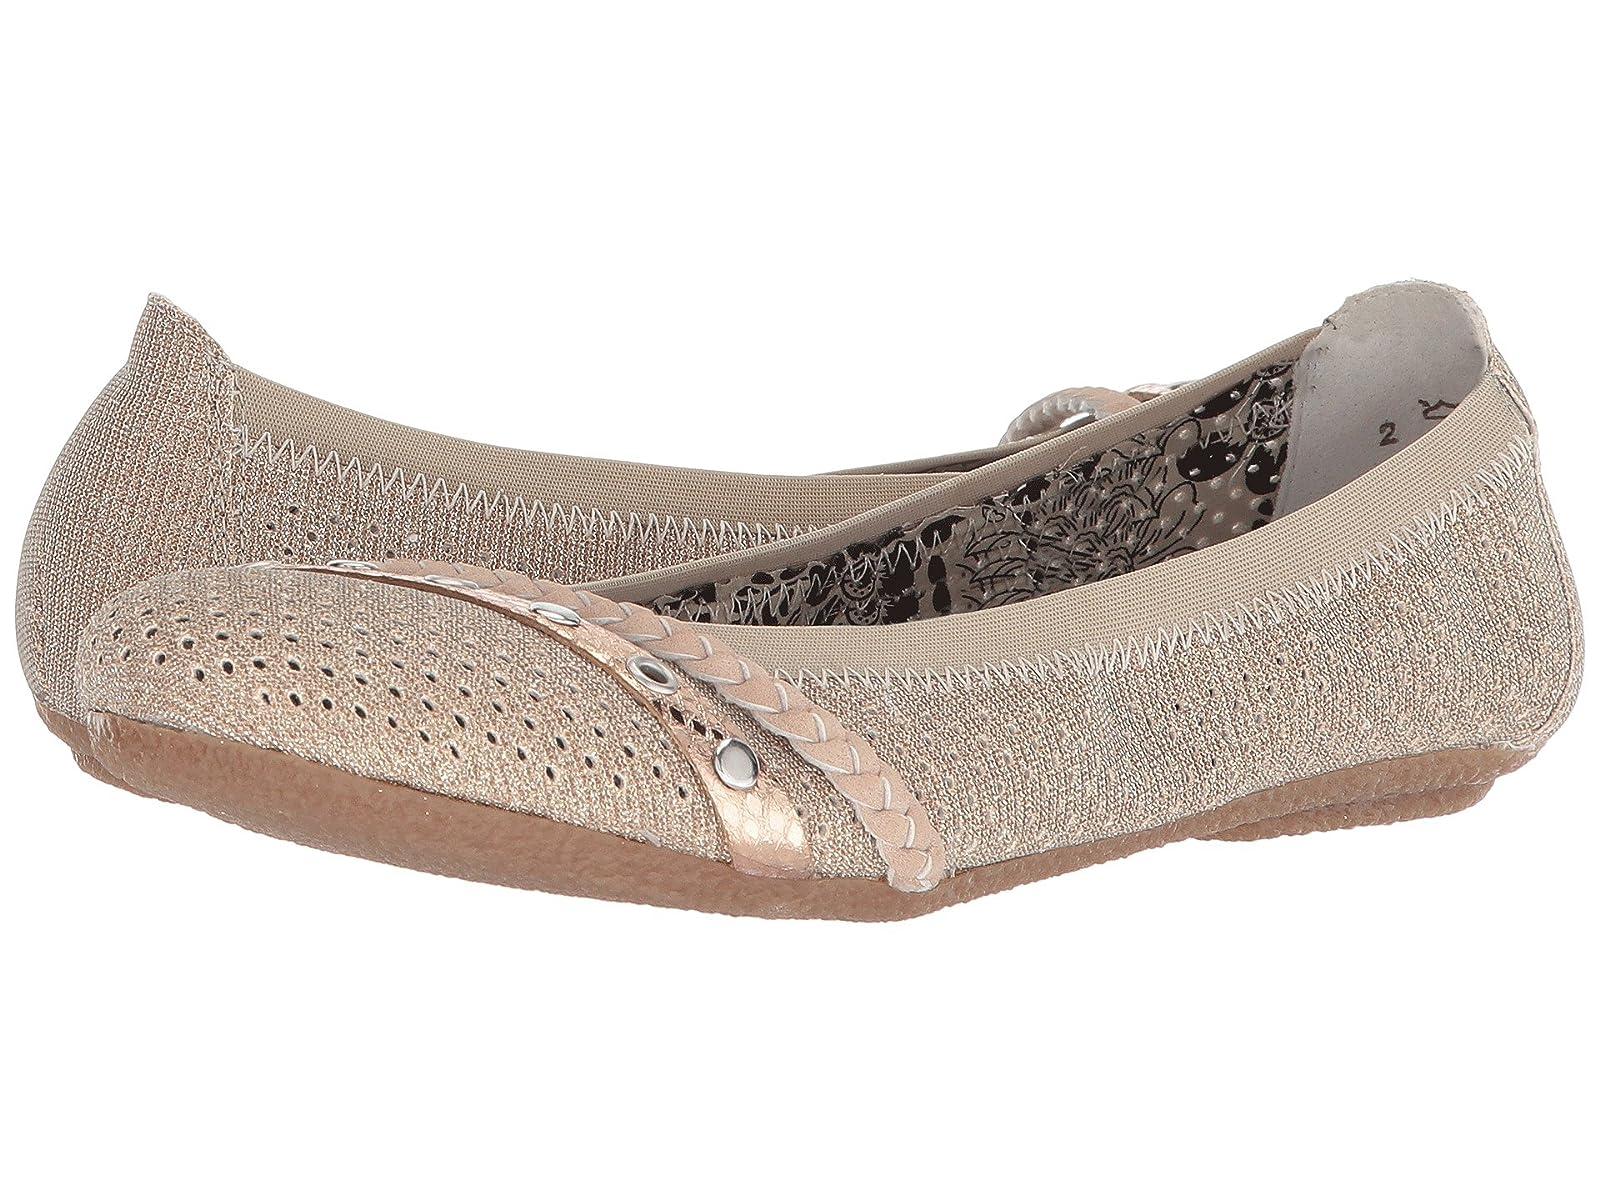 Rieker 41496 Savannah 96Atmospheric grades have affordable shoes